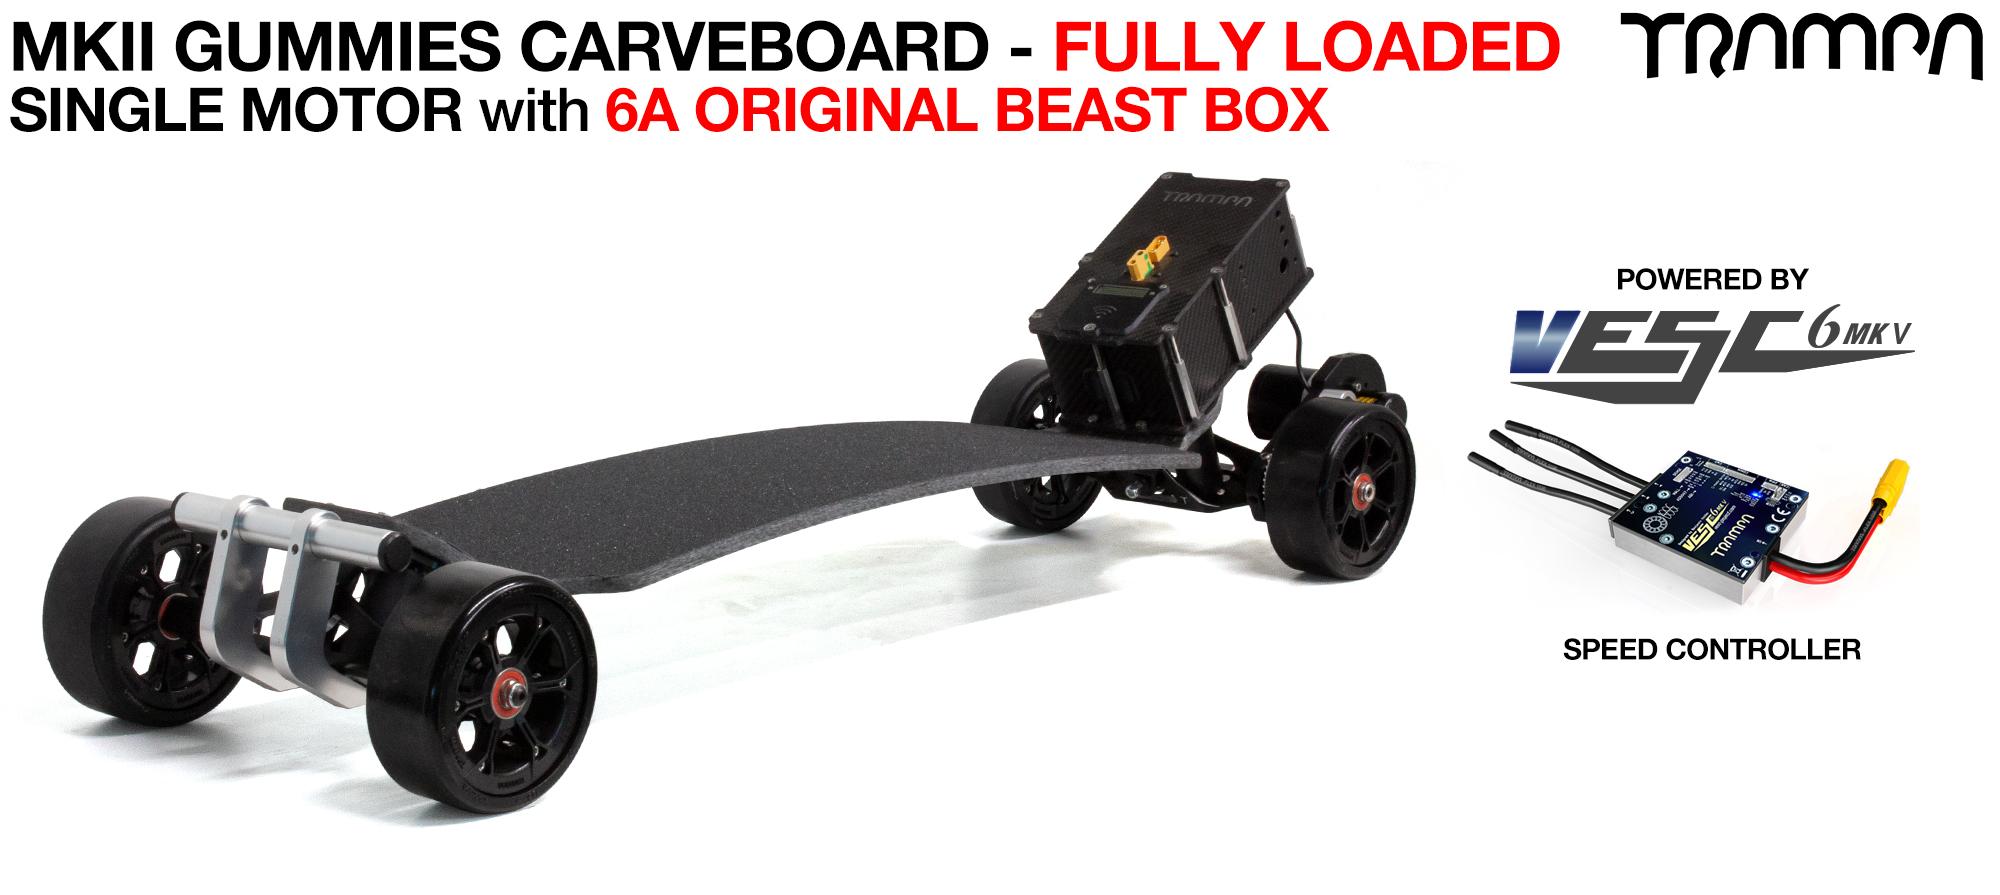 TRAMPA's MkII Electric GUMMIES Carveboard - uses Mini Spring Trucks with MkII Carve board Motor Mount,s Custom TRAMPA hubs & 125mm GUMMIES longboard Tyres - SINGLE Motor FULLY LOADED